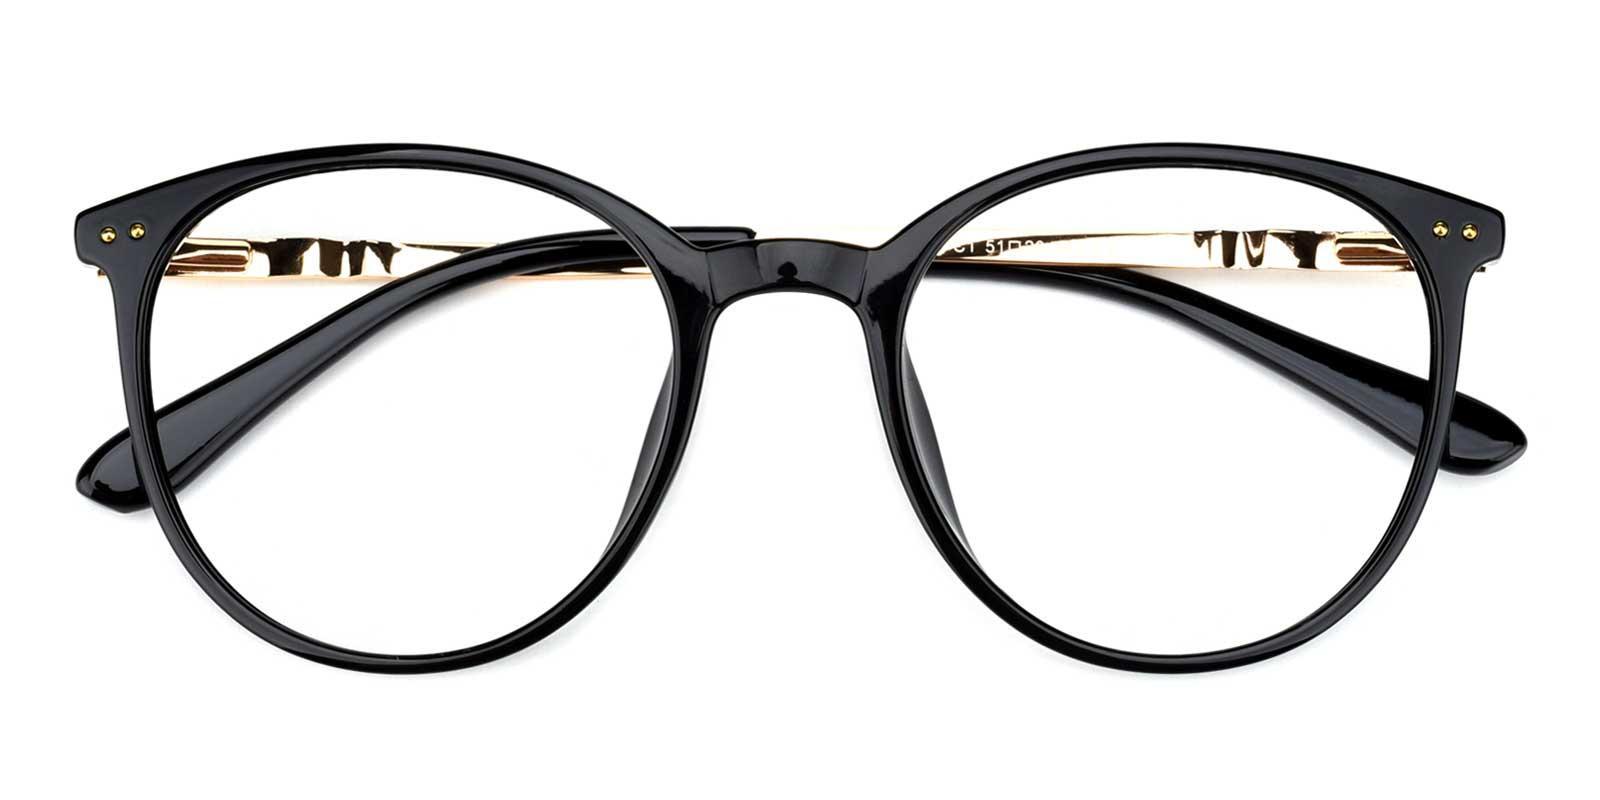 Peacock-Black-Round-Acetate-Eyeglasses-detail